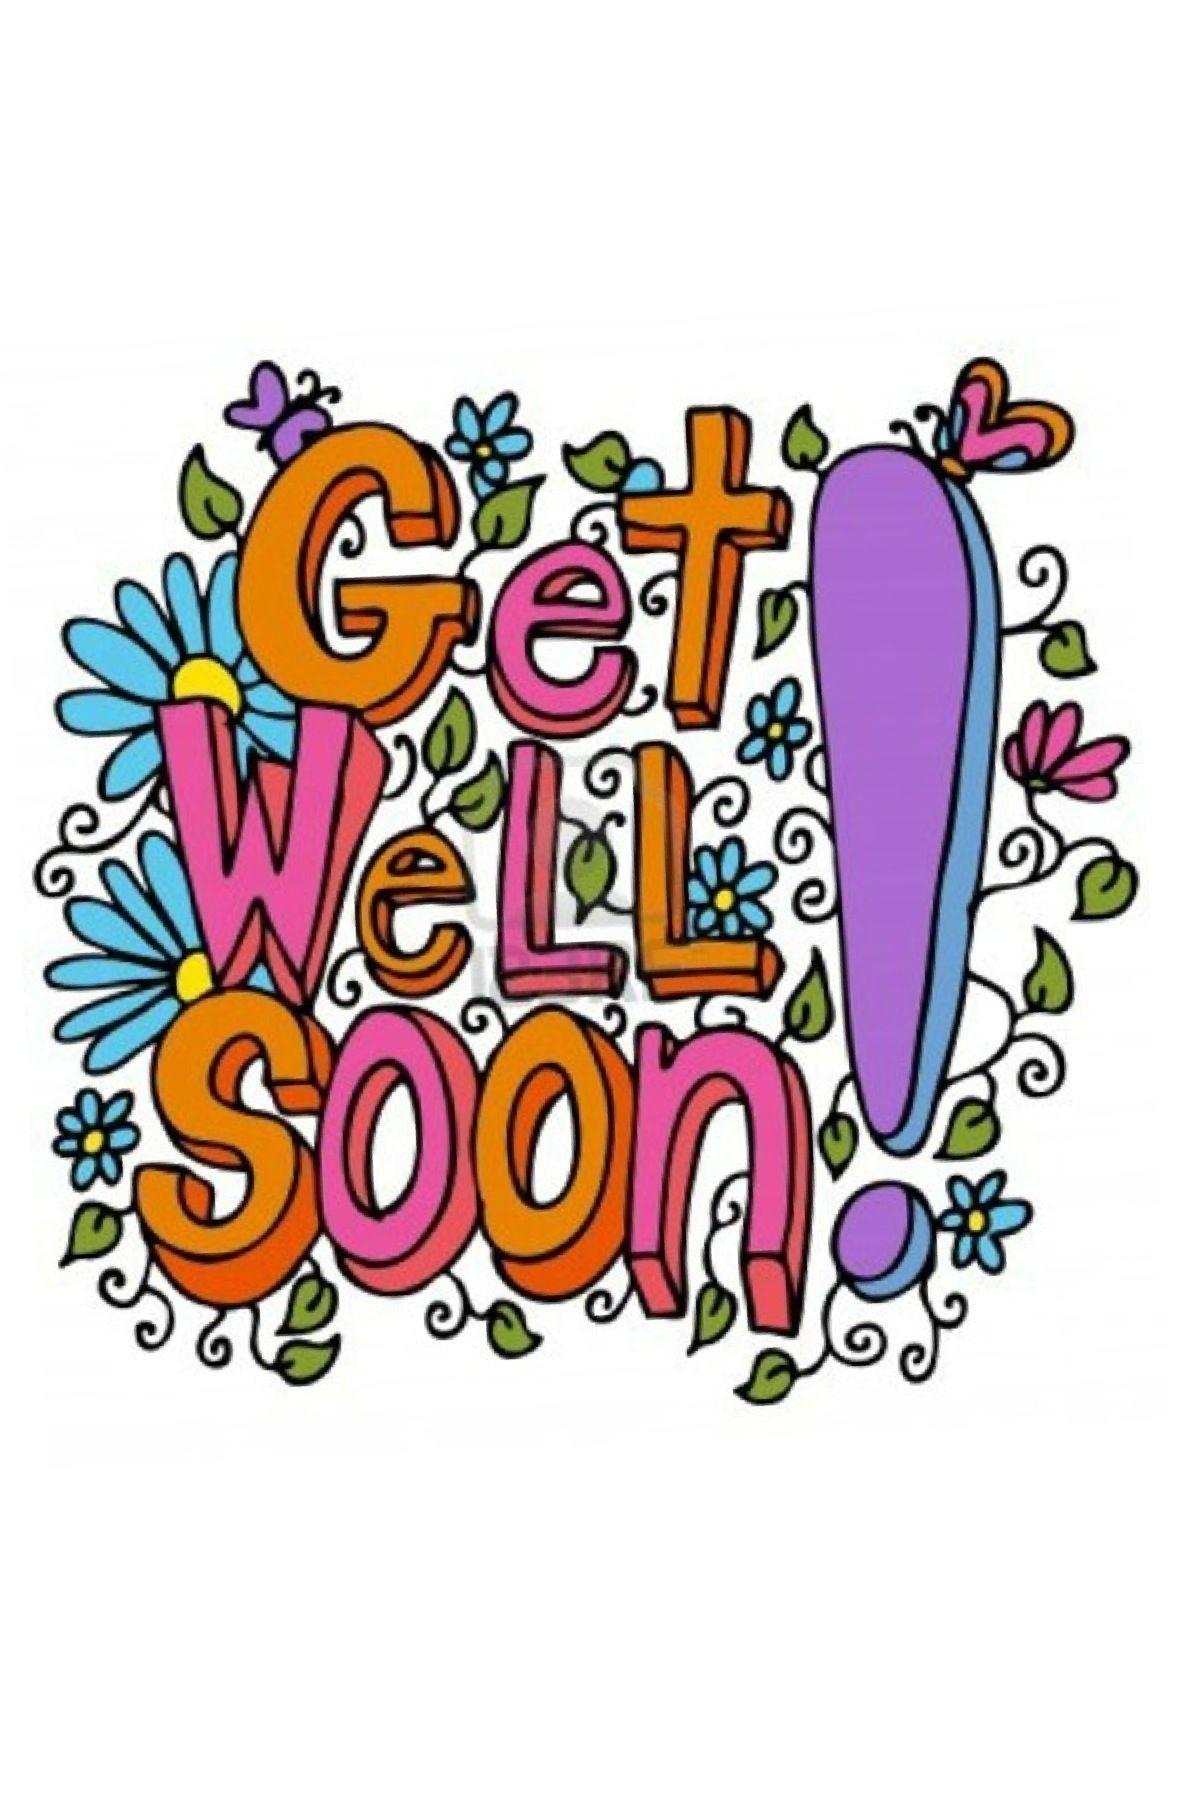 Medium Crop Of Get Well Soon Message